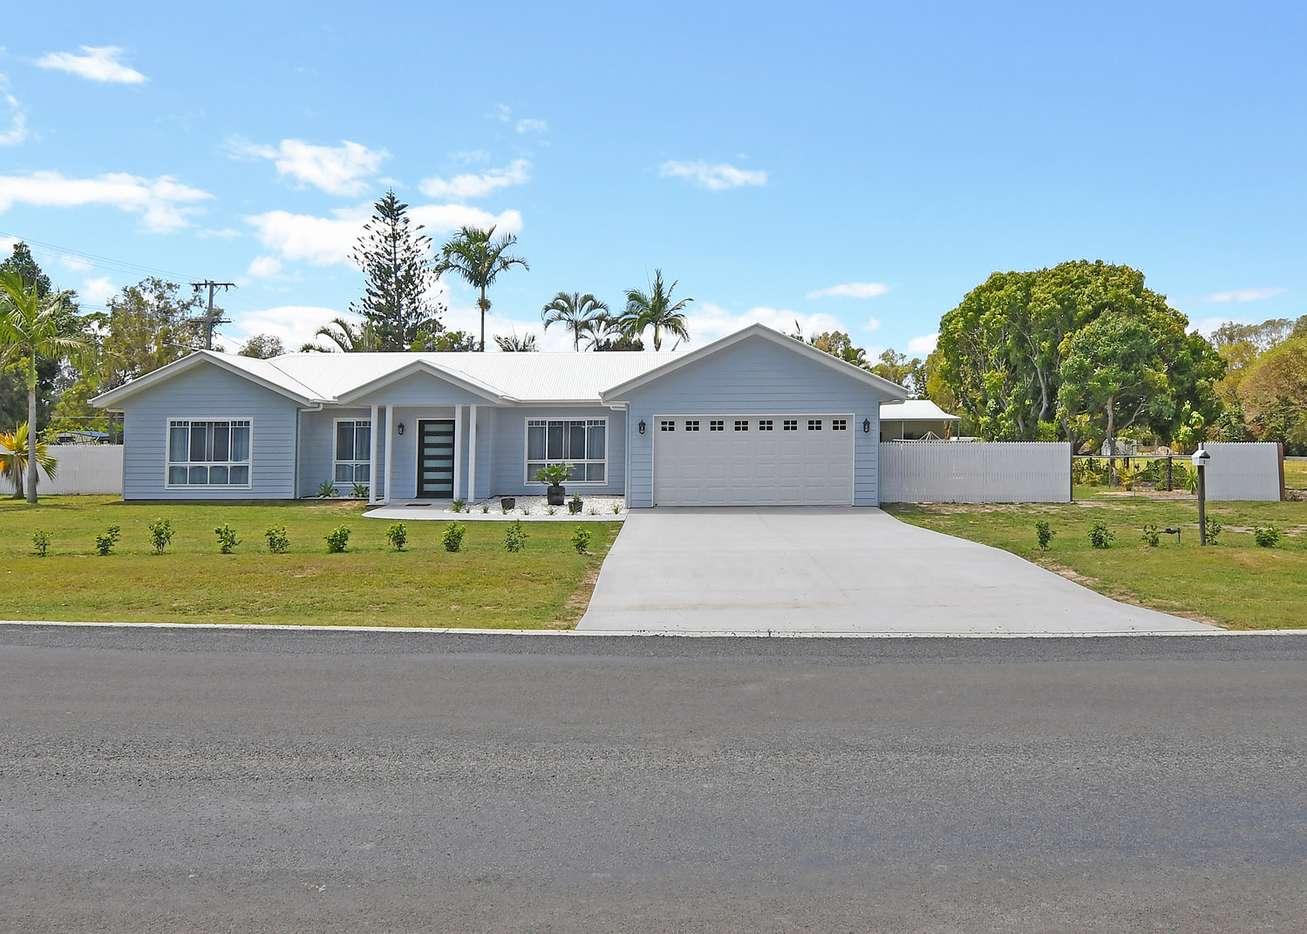 Main view of Homely house listing, 2 CARRICK WAY, Wondunna, QLD 4655